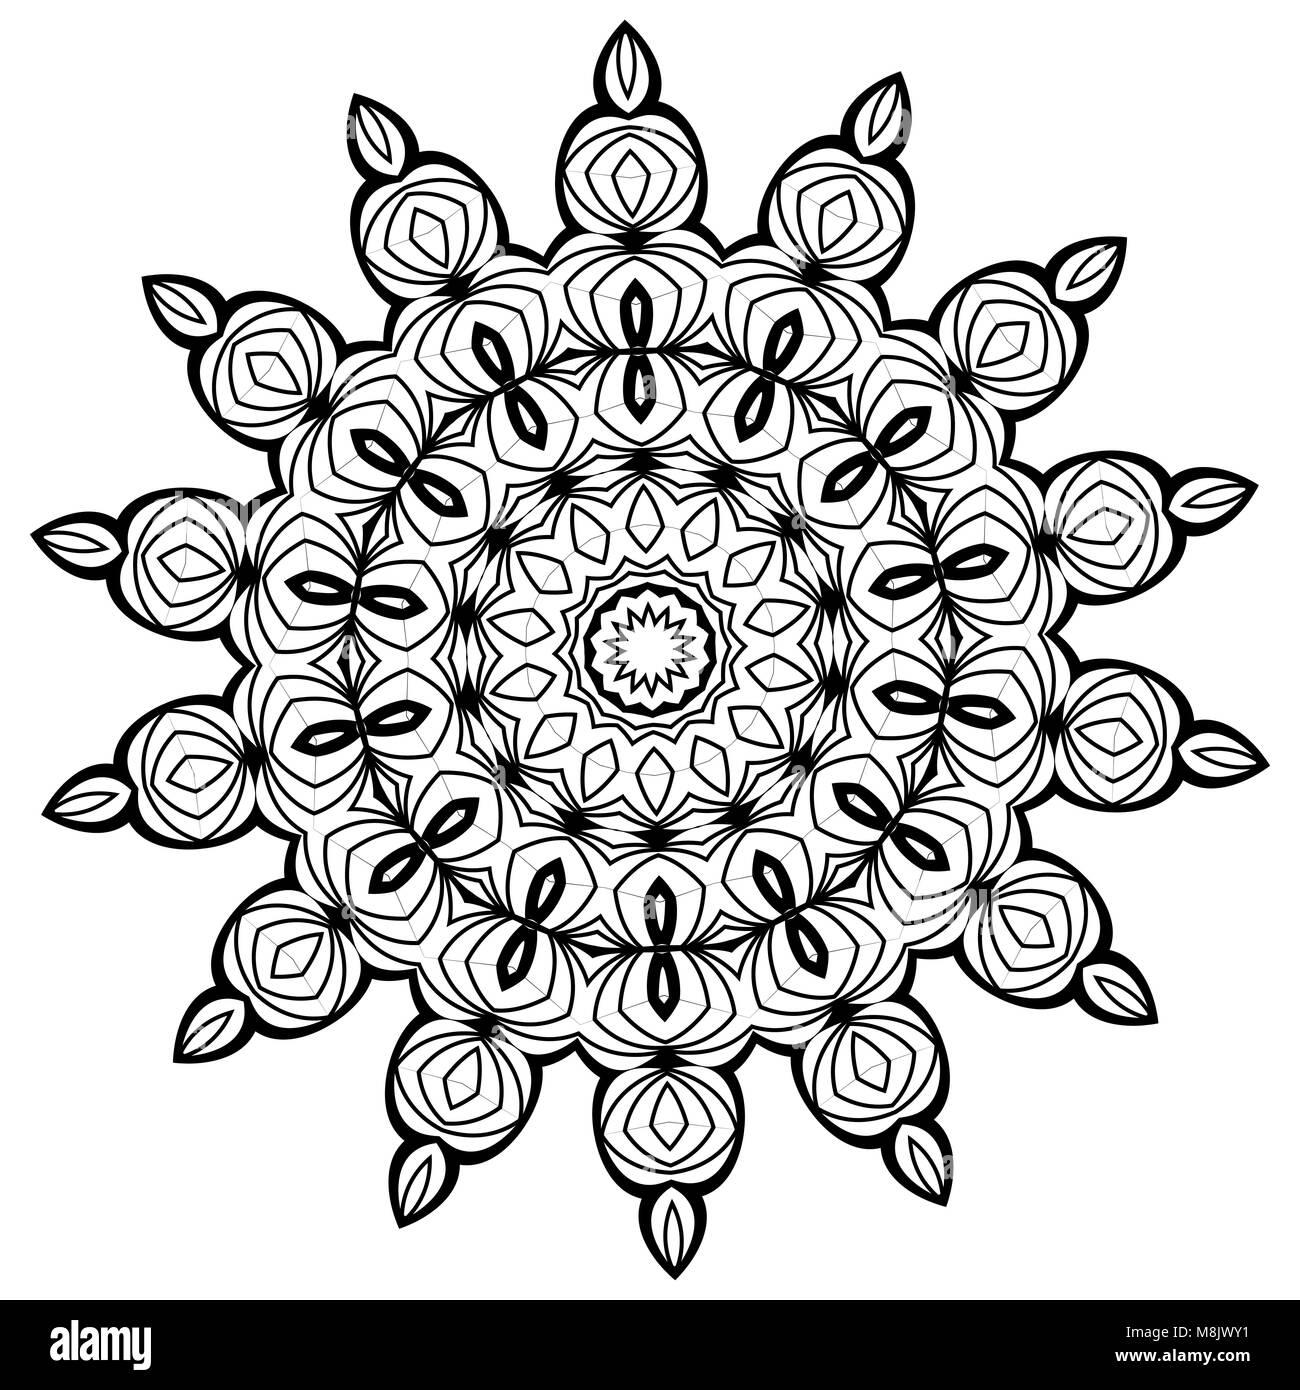 Mandala. Ethnic decorative elements. Vintage decorative elements. Oriental pattern illustration. Islam, Arabic, - Stock Image